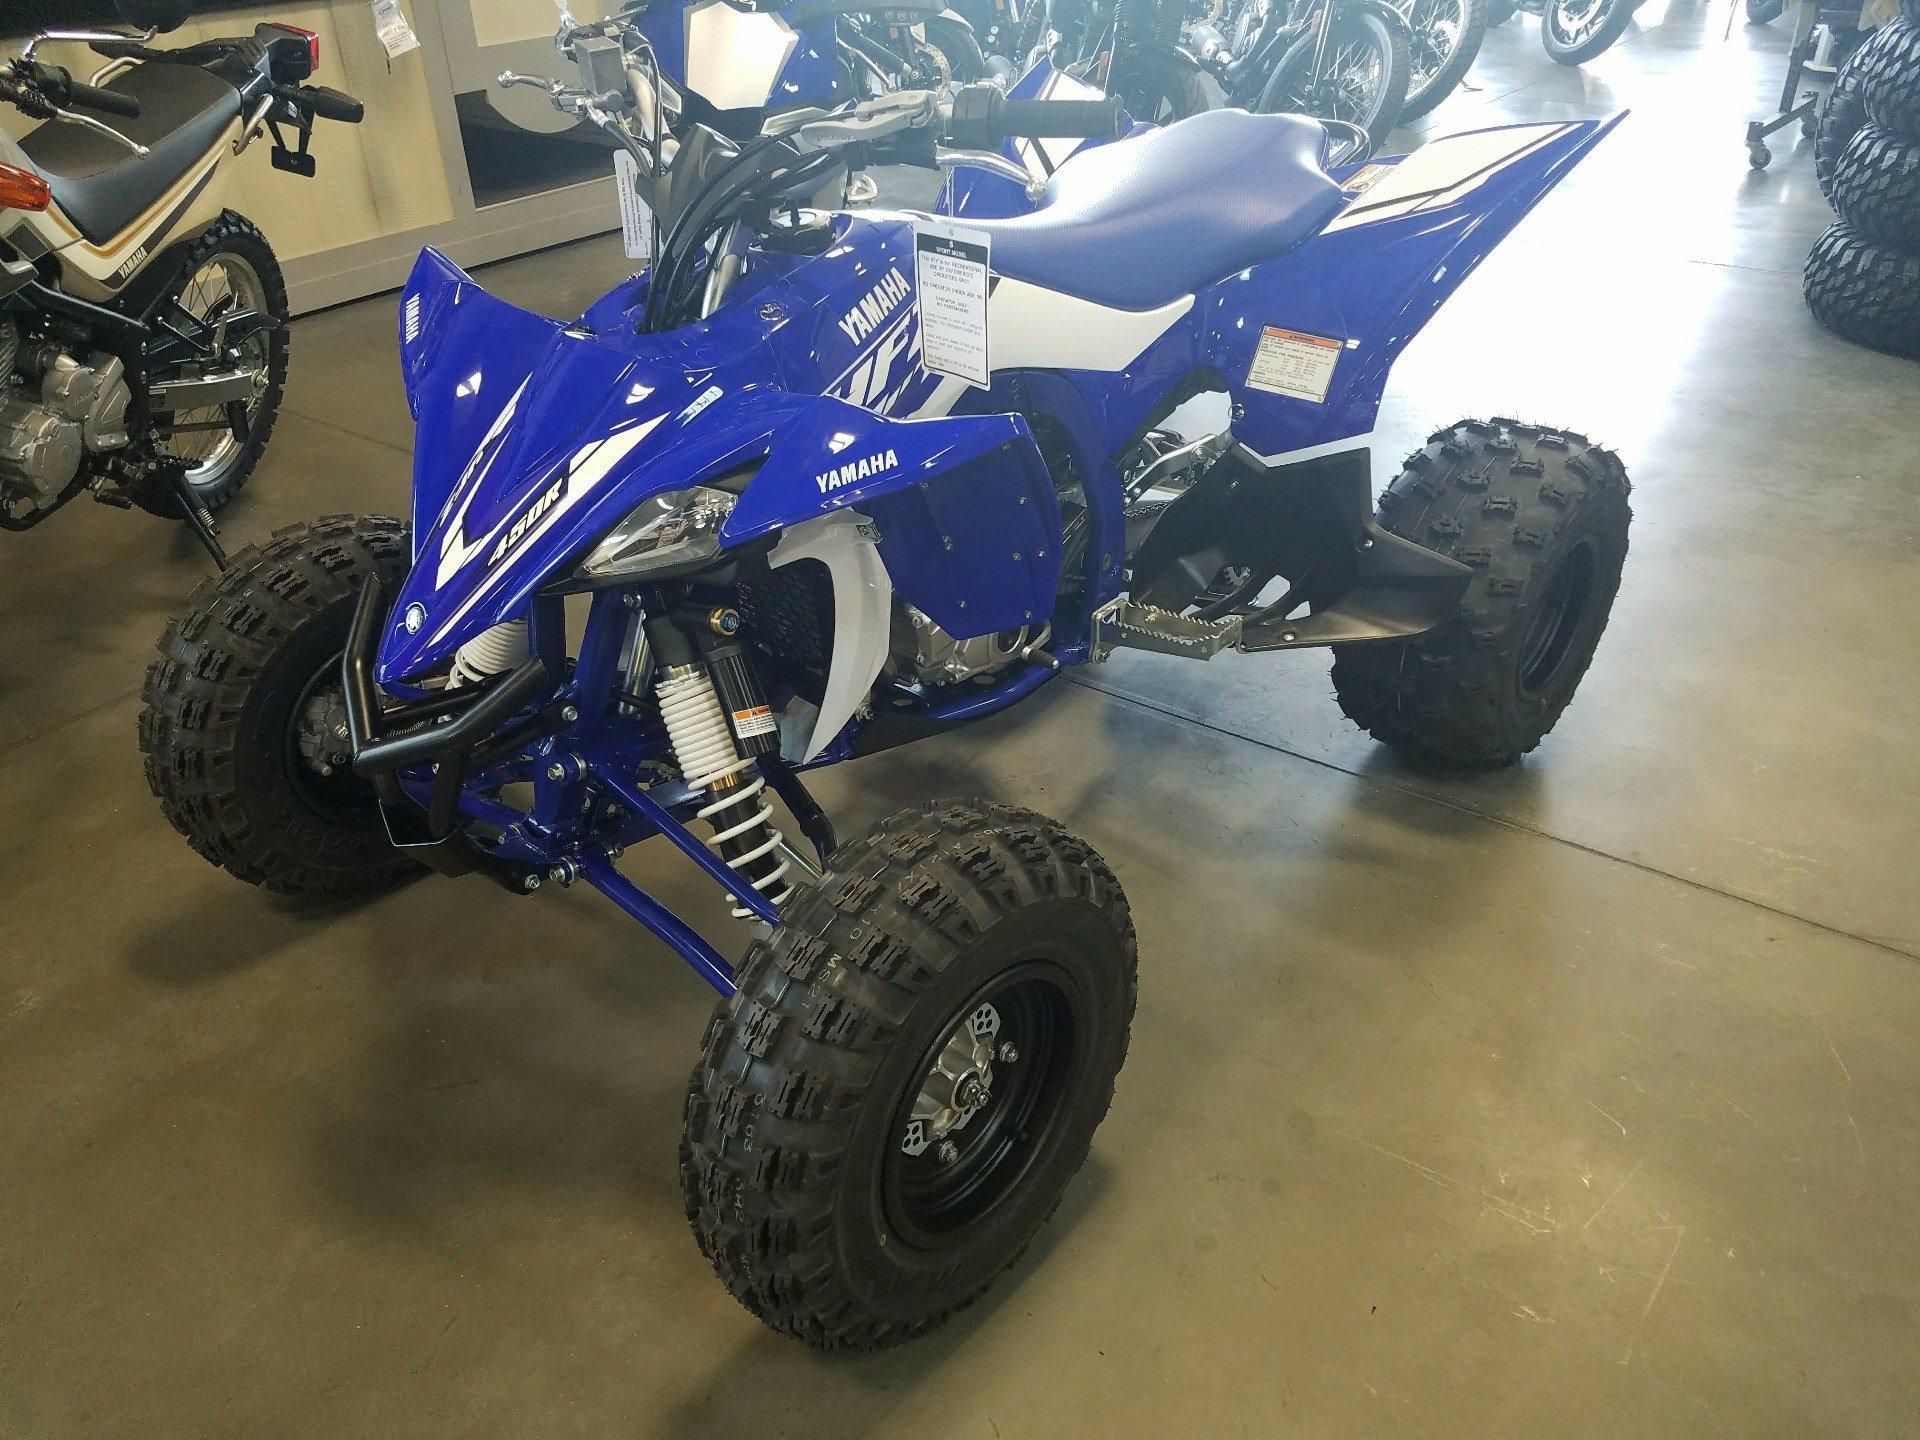 2018 Yamaha YFZ450R for sale 167